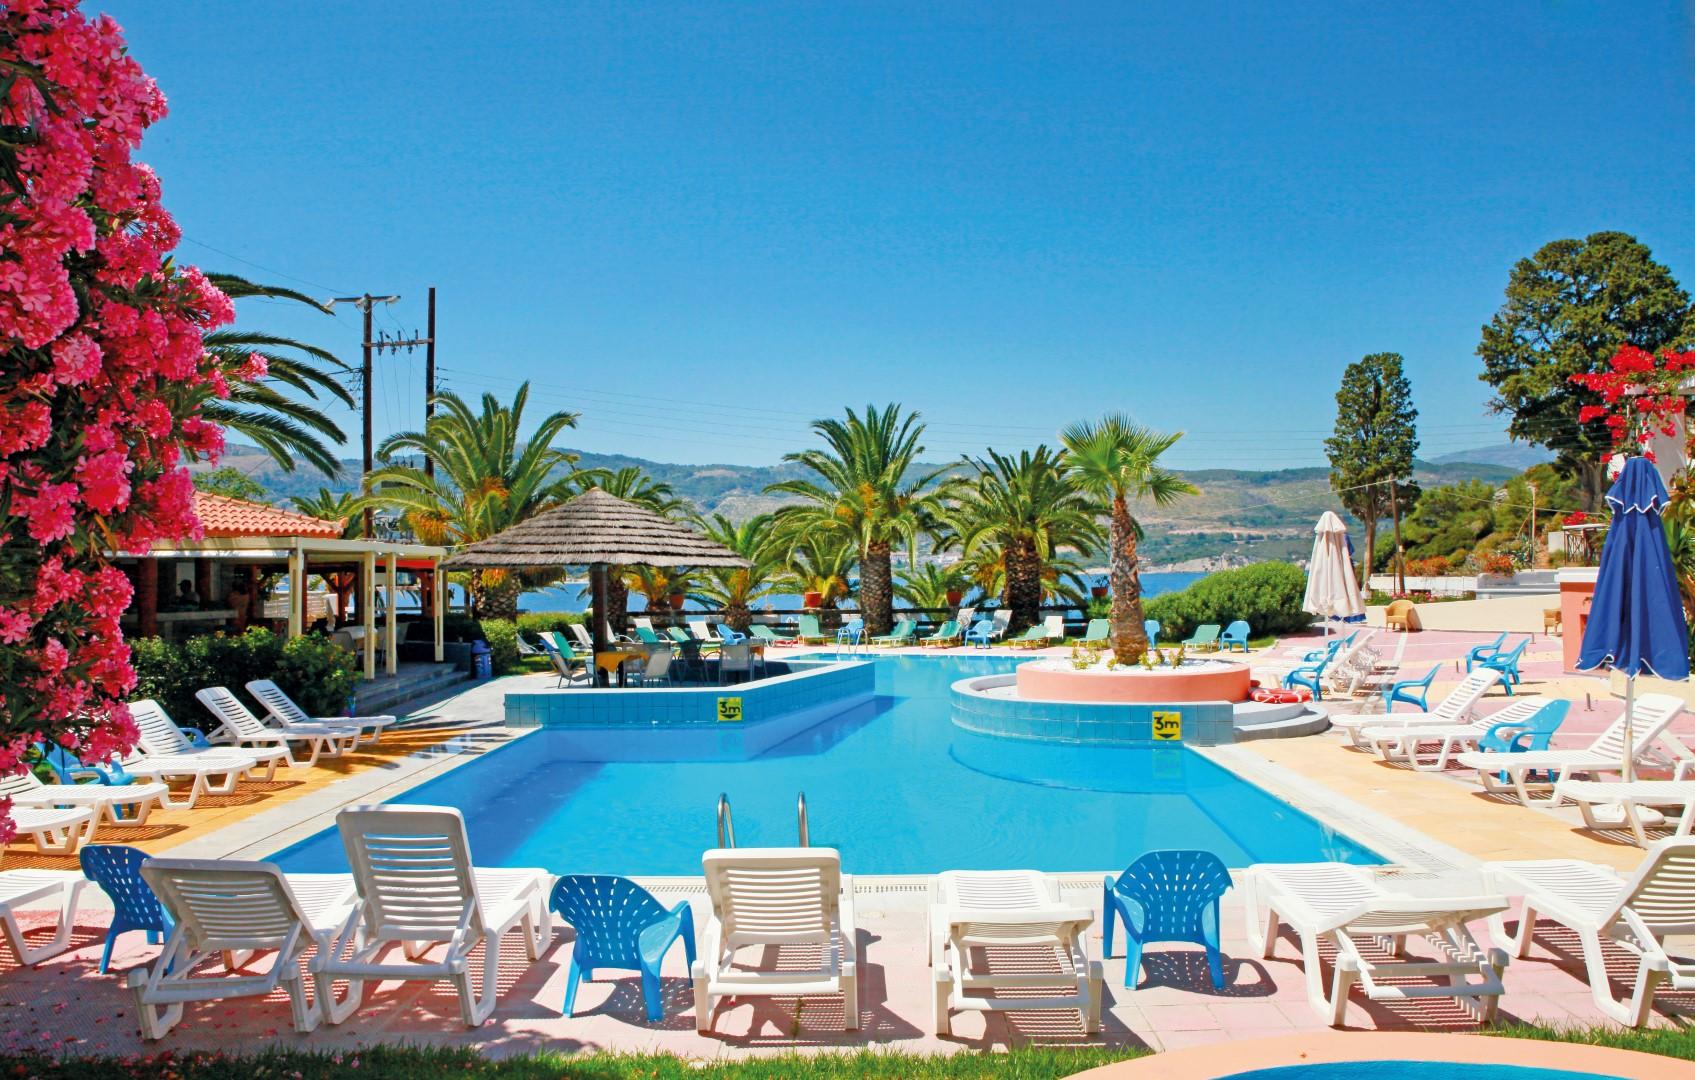 Blue Style Resort